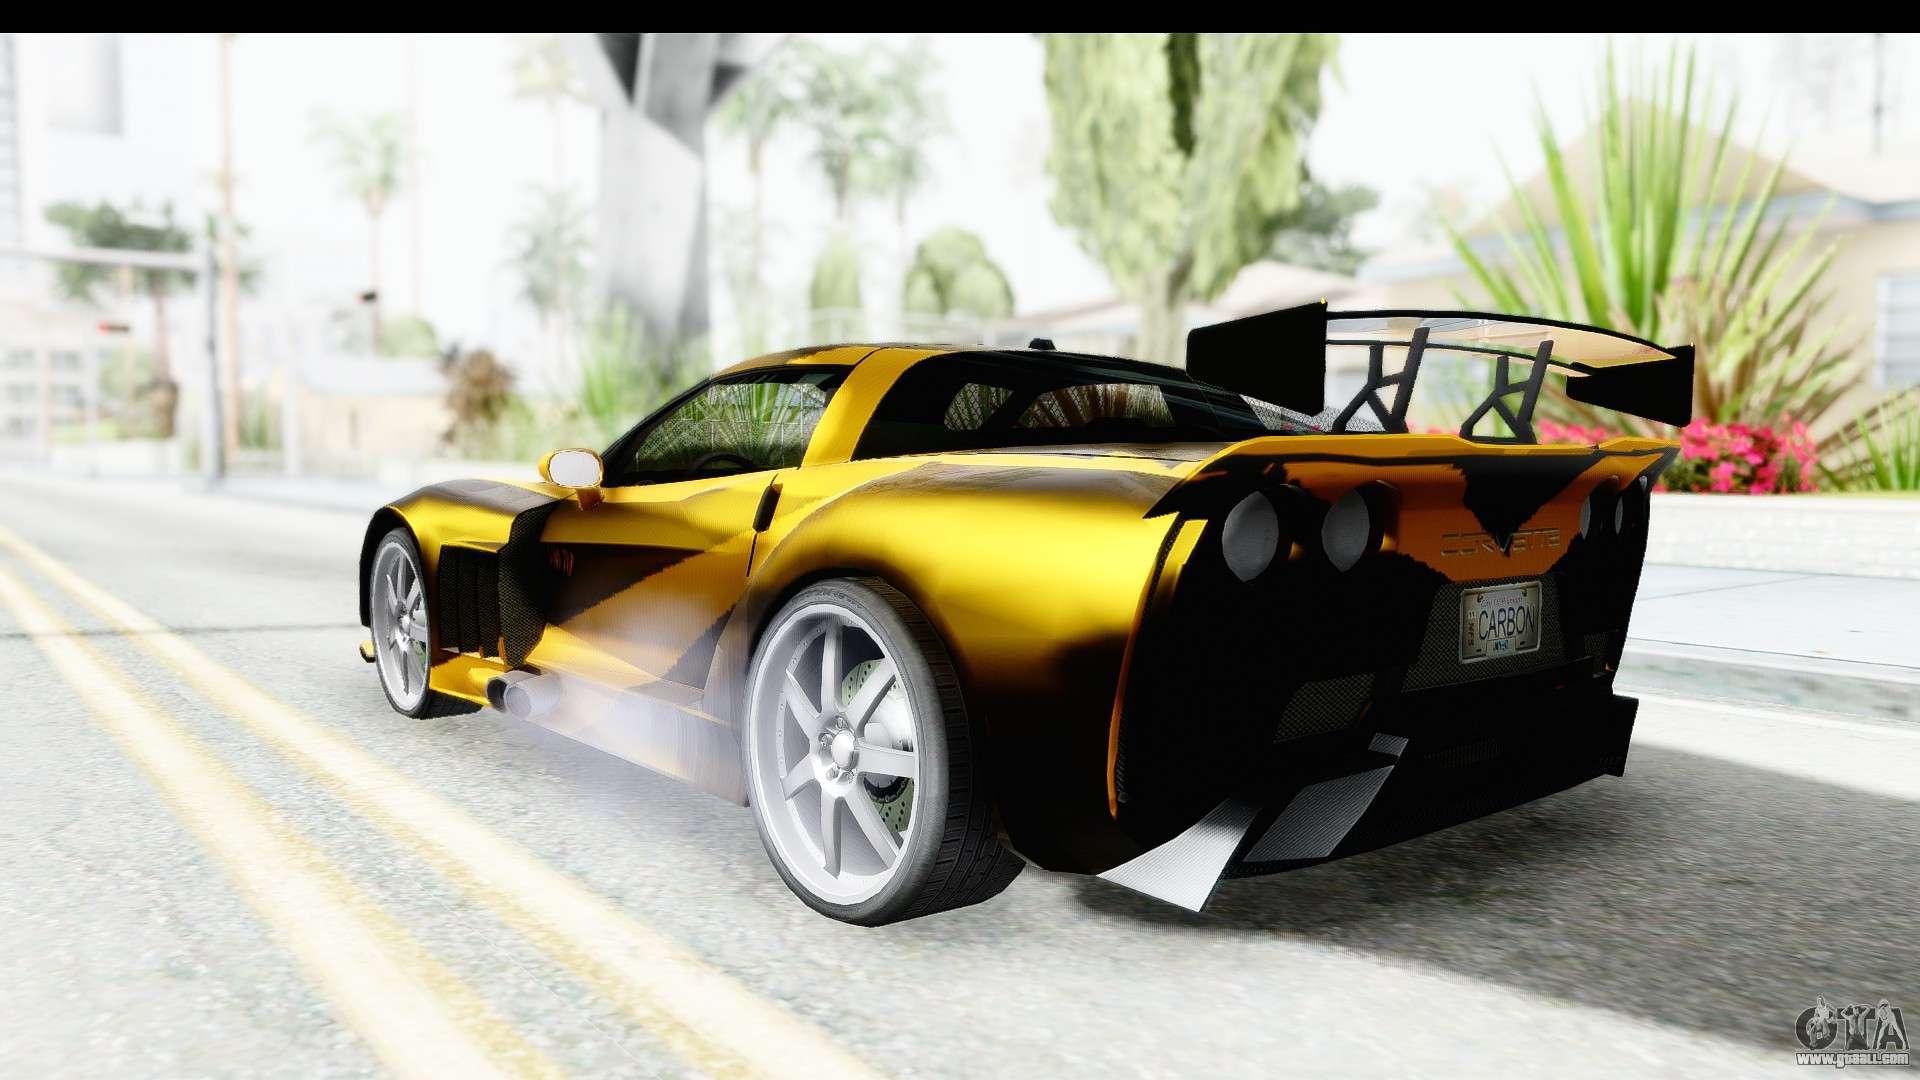 GTA San Andreas B NFS Game Fully Pc Games